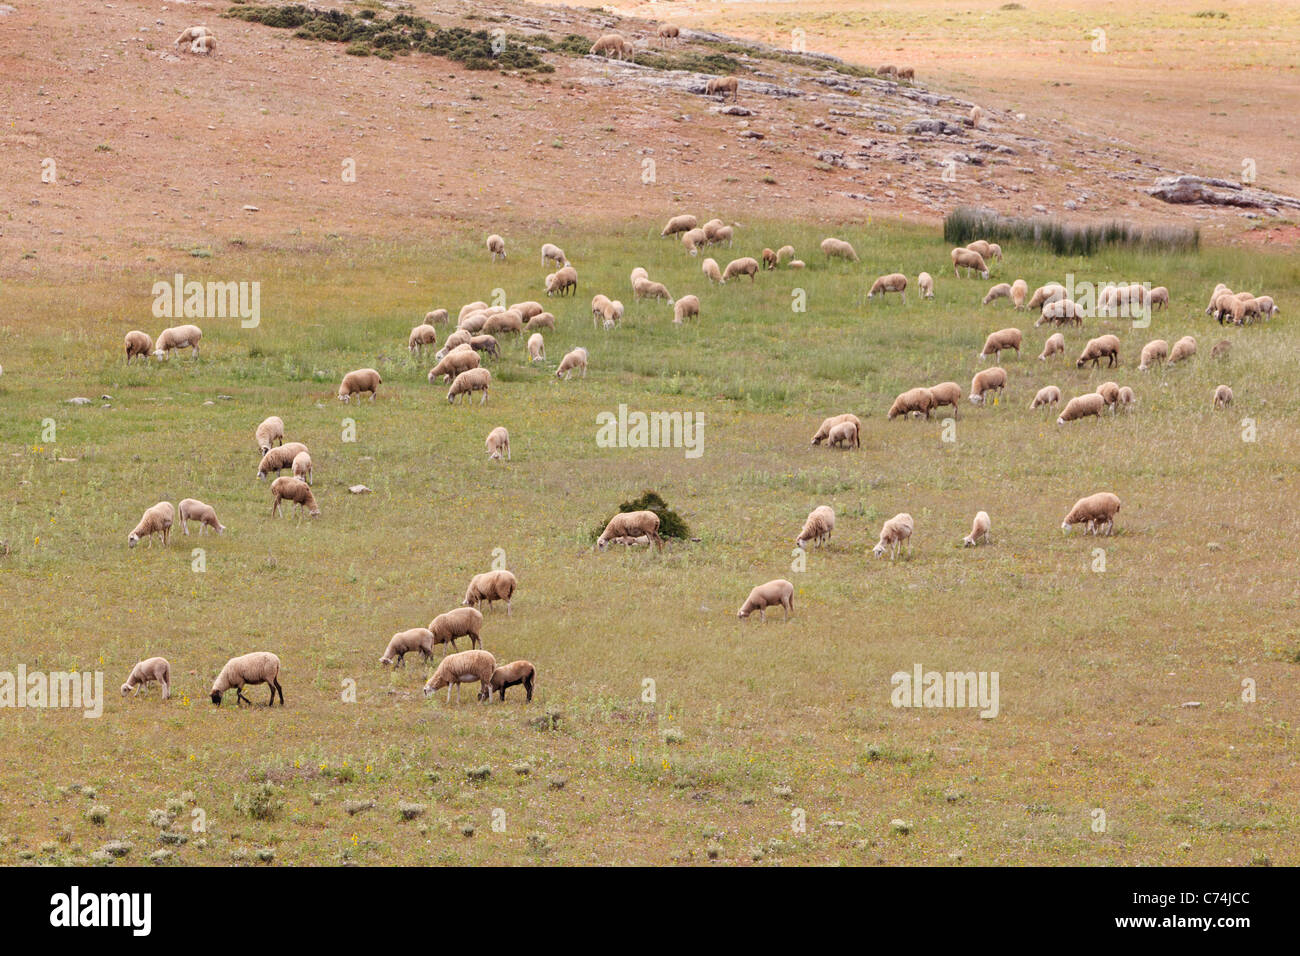 Sheep grazing in the Serrania de Ronda, Malaga Province, Spain. - Stock Image